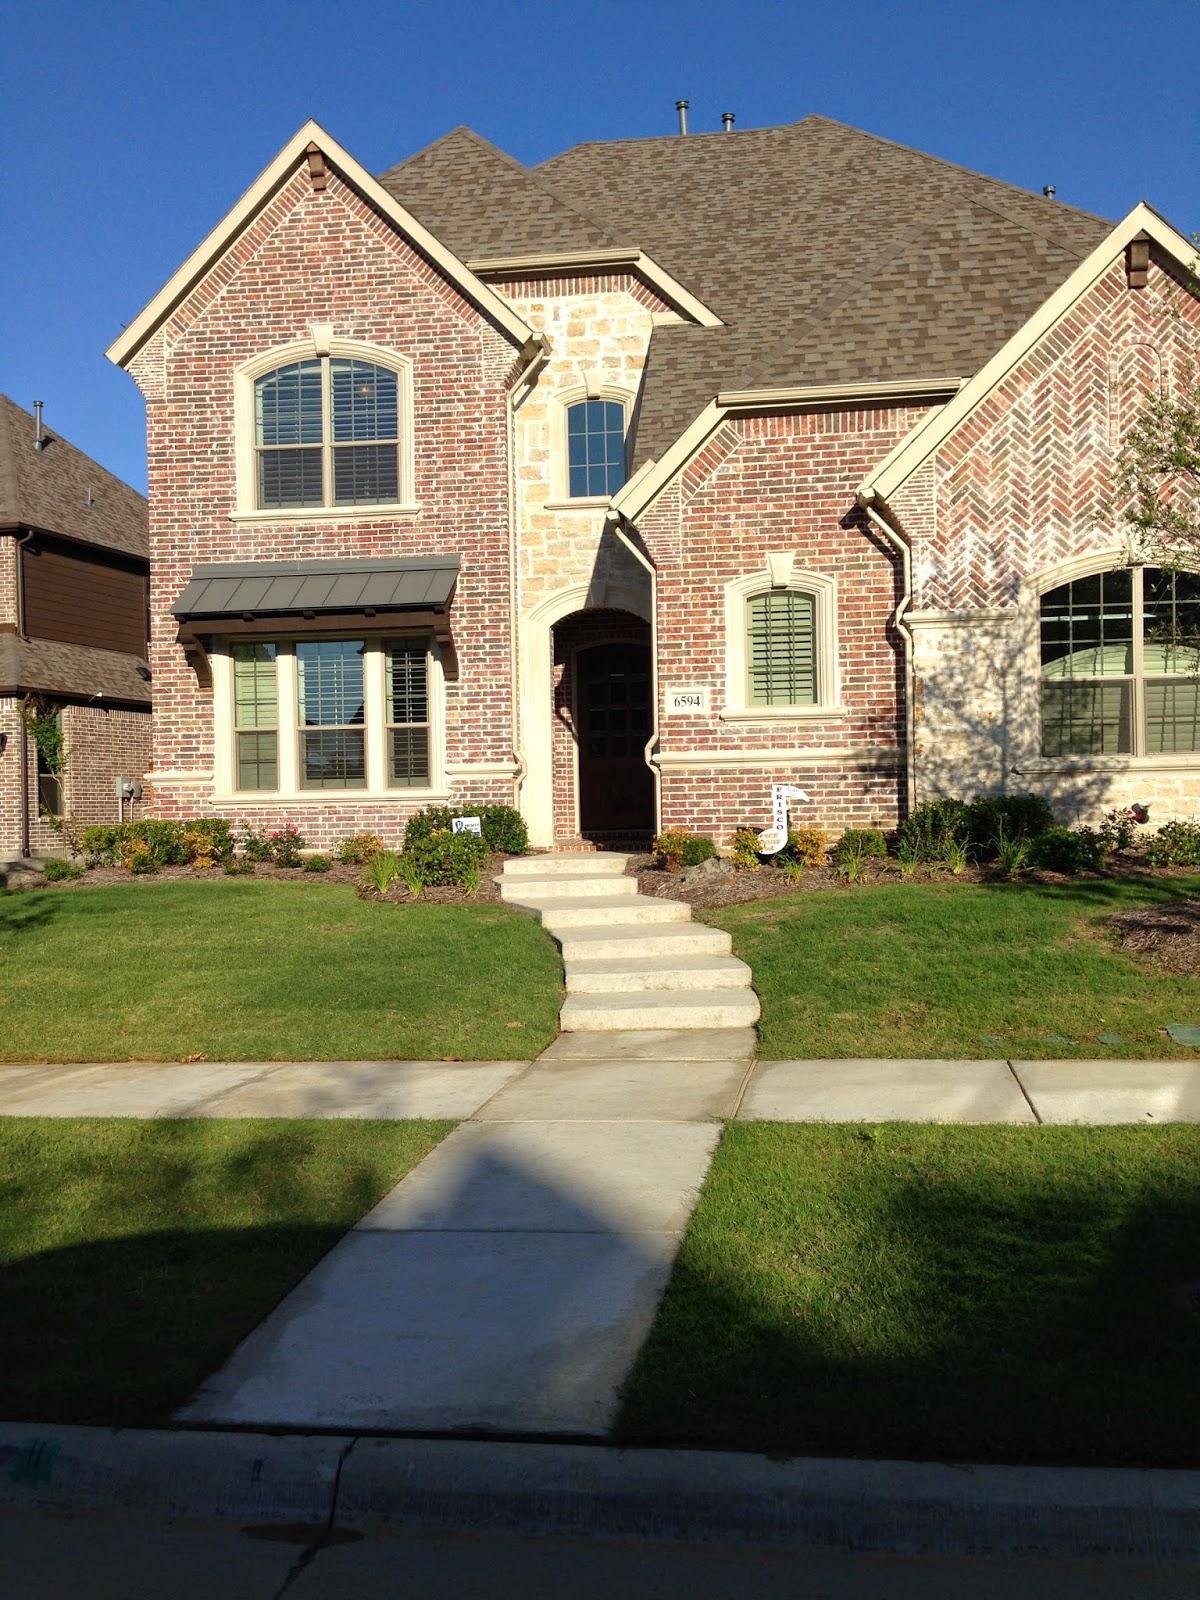 Lauren stack stack house design decisions - Lennar homes interior paint colors ...